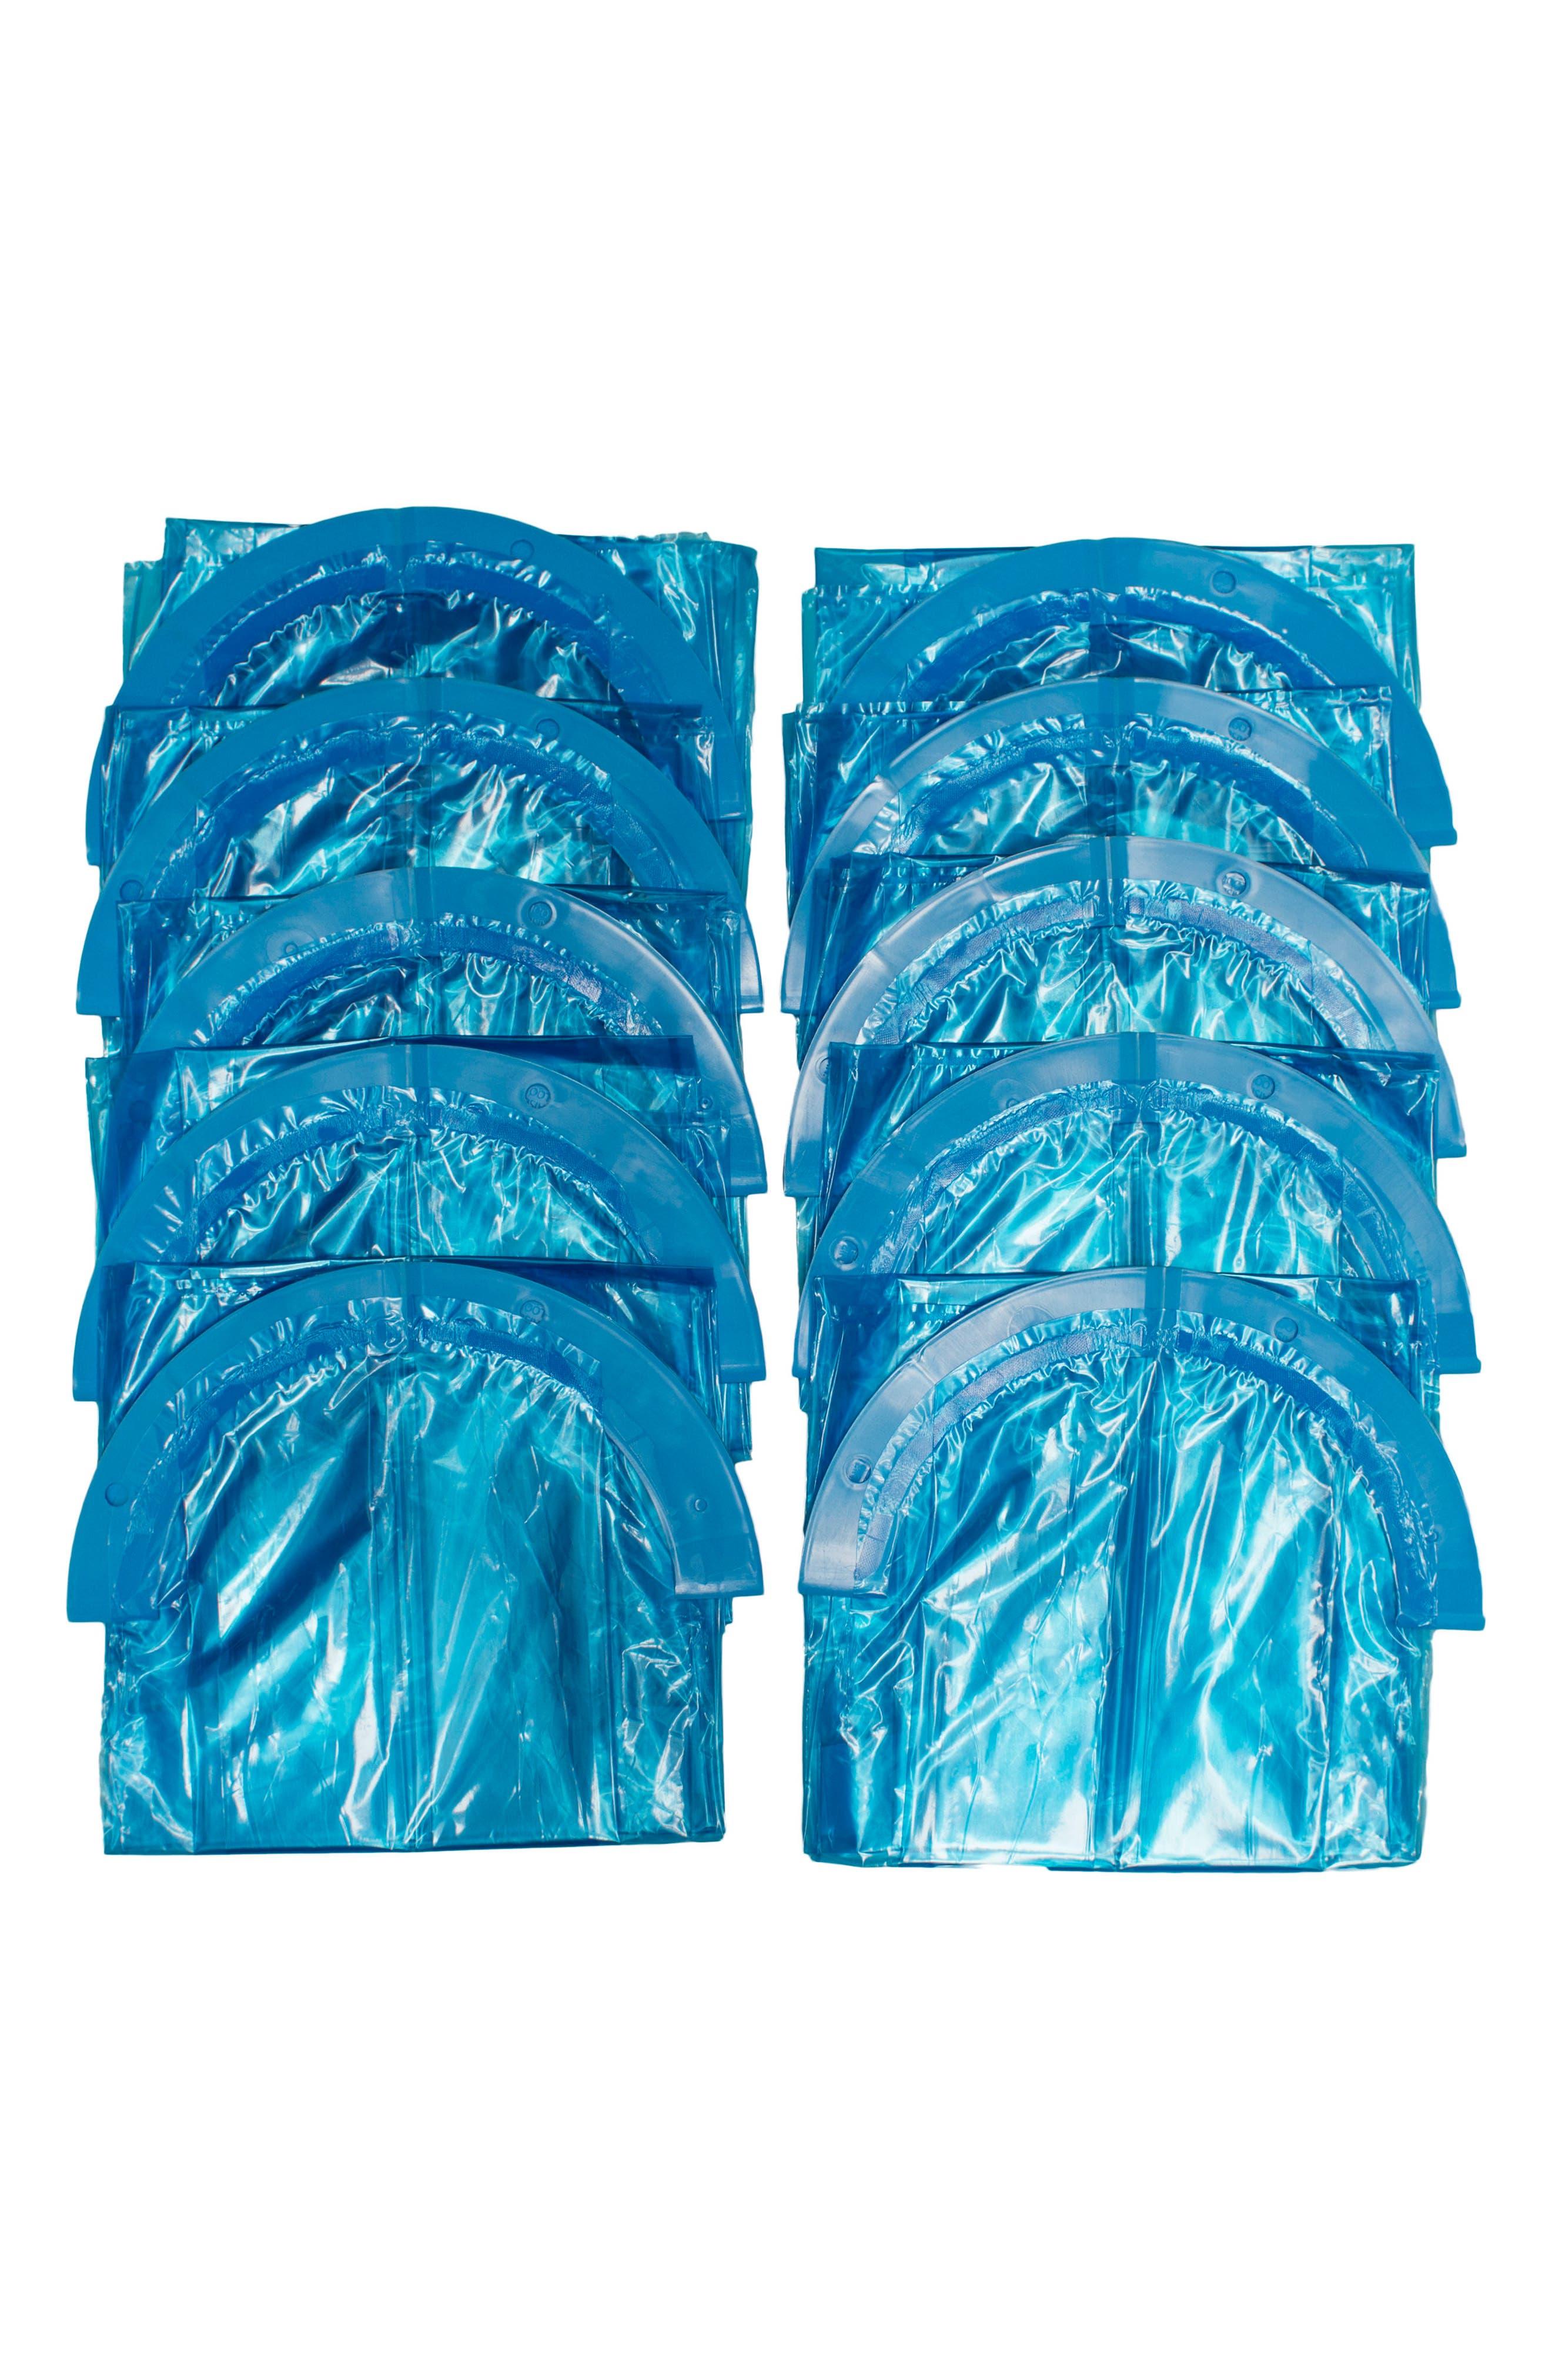 Prince Lionheart Twist'r Diaper Disposal System Refill Bags